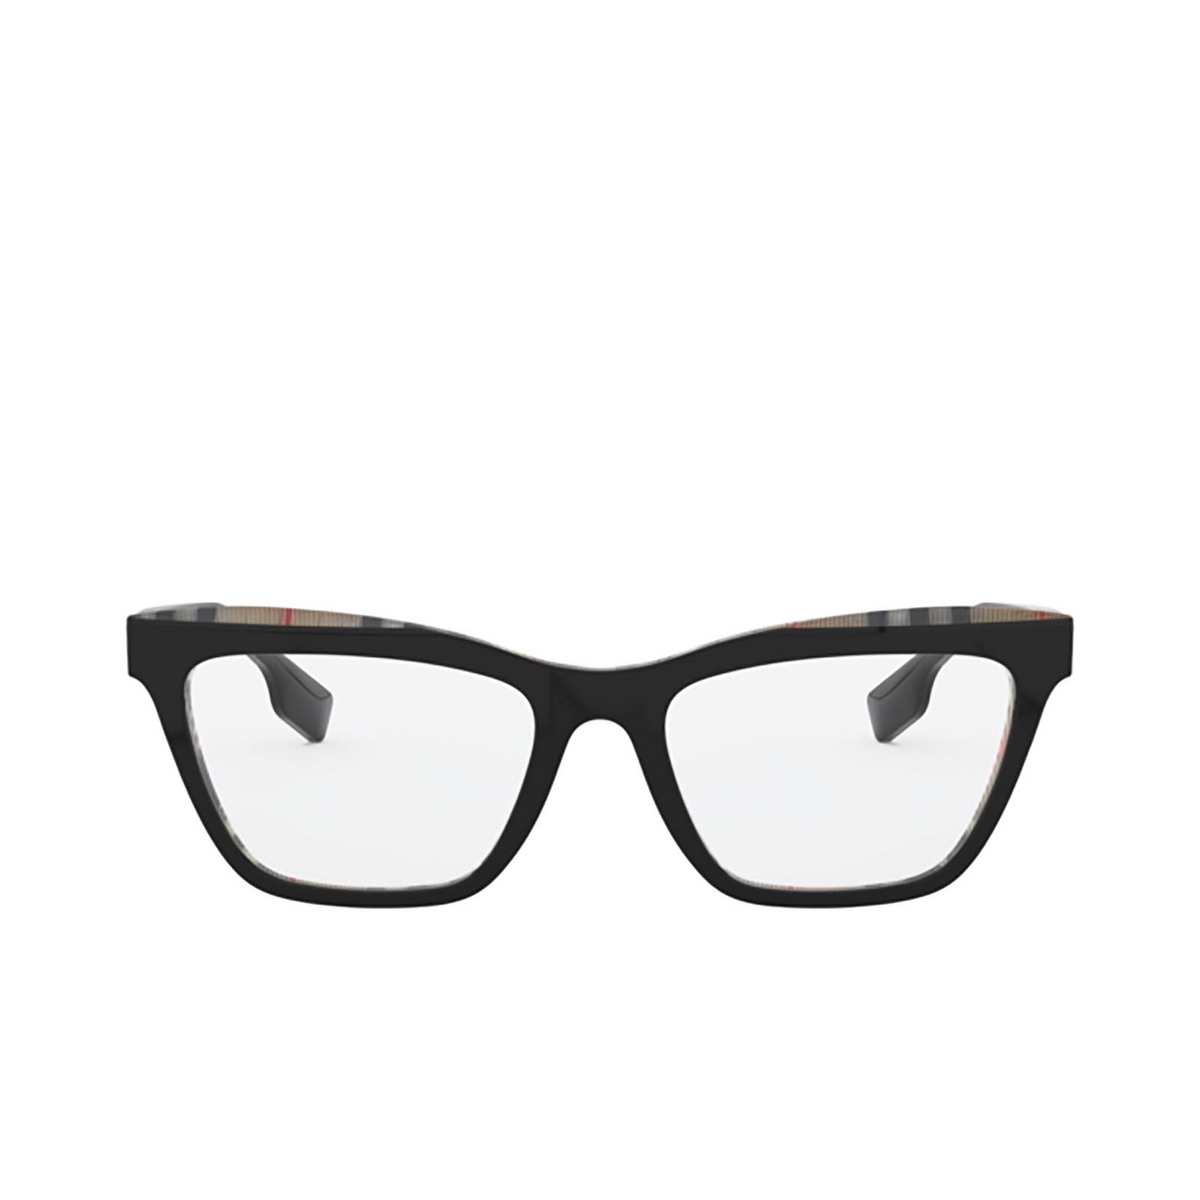 Burberry® Square Eyeglasses: Ryde BE2309 color Top Black On Vintage Check 3828.